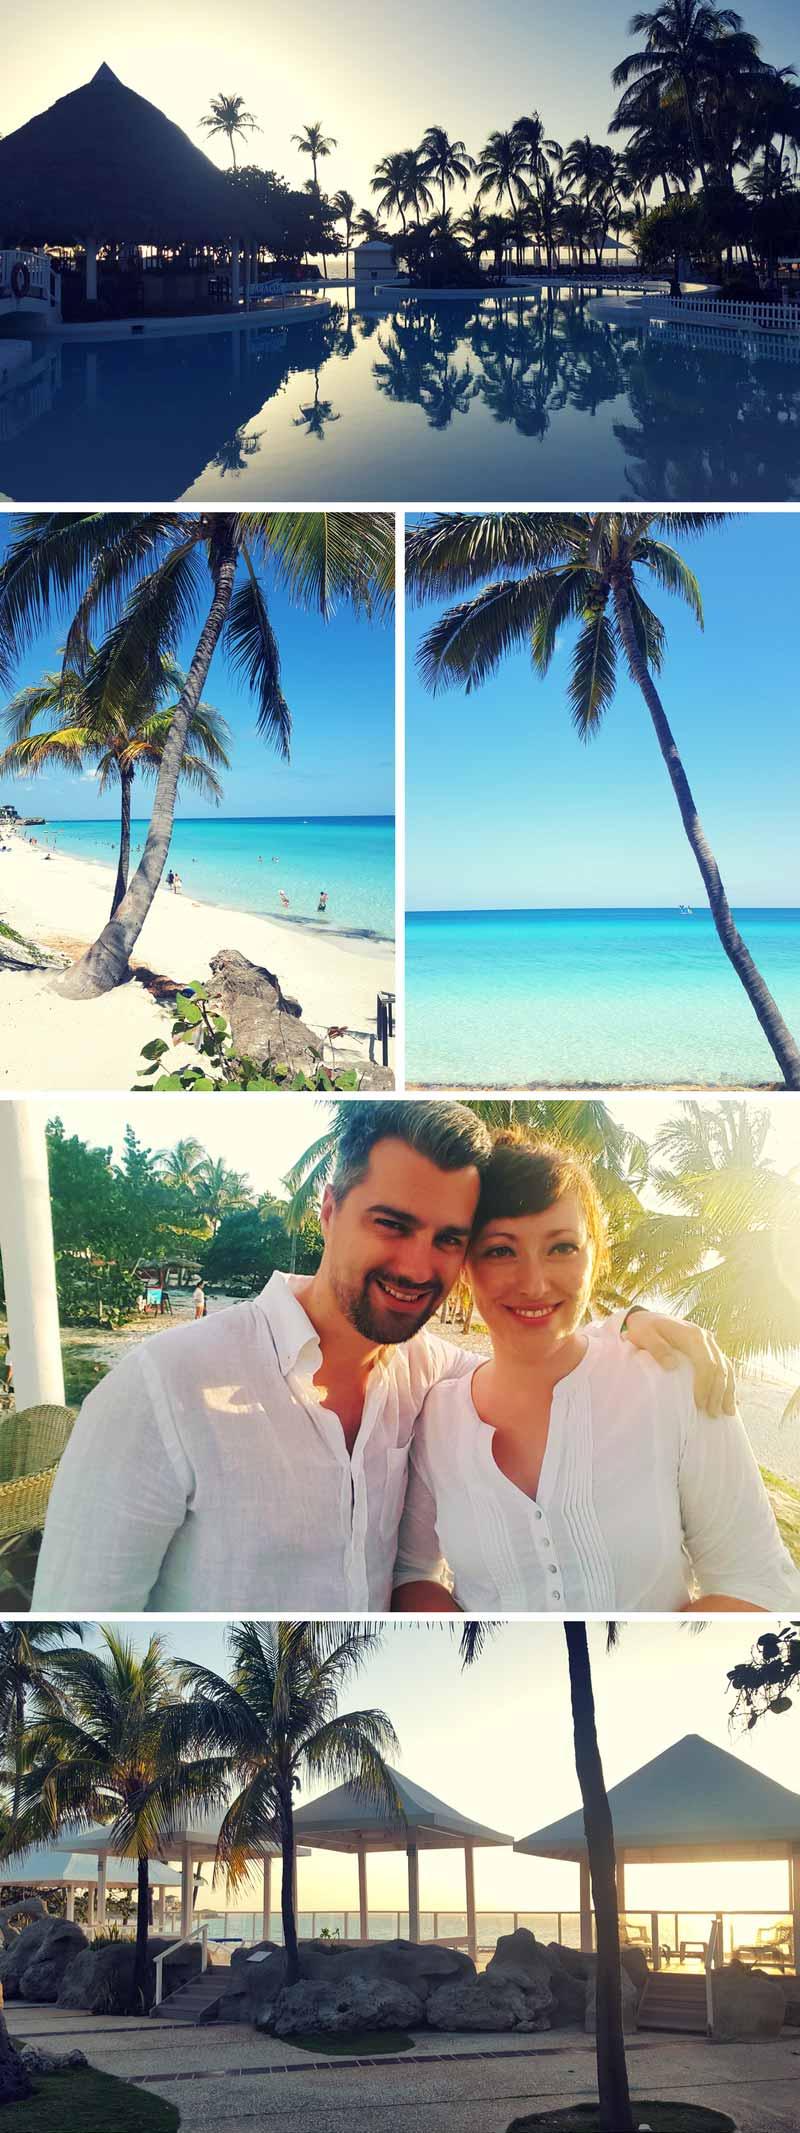 Kuba-Hotel-Melia-Varadero